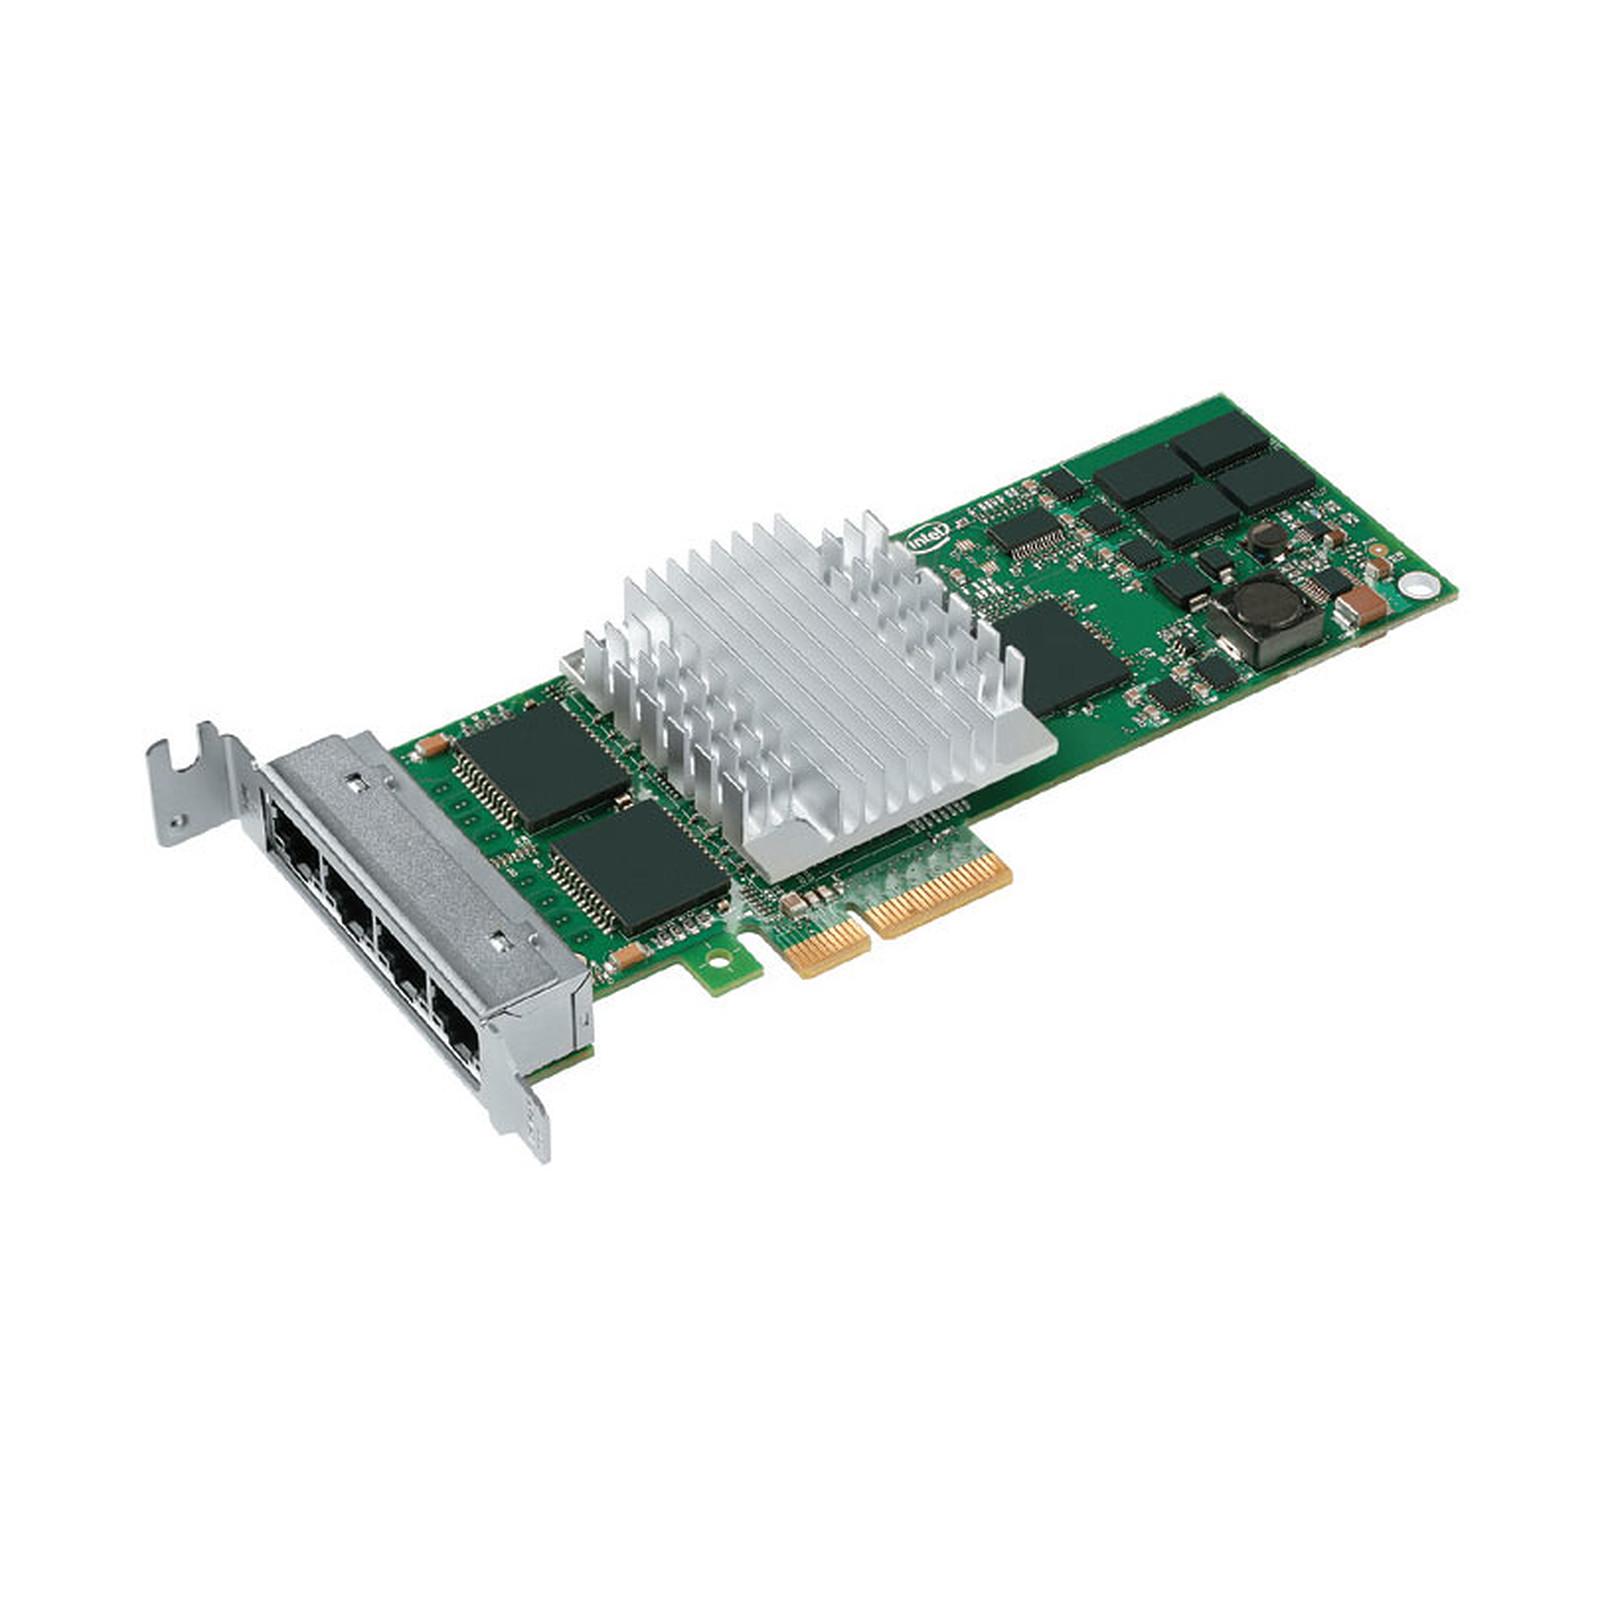 Intel PRO/1000 PT Quad Port Low Profile Server Adapter (bulk)